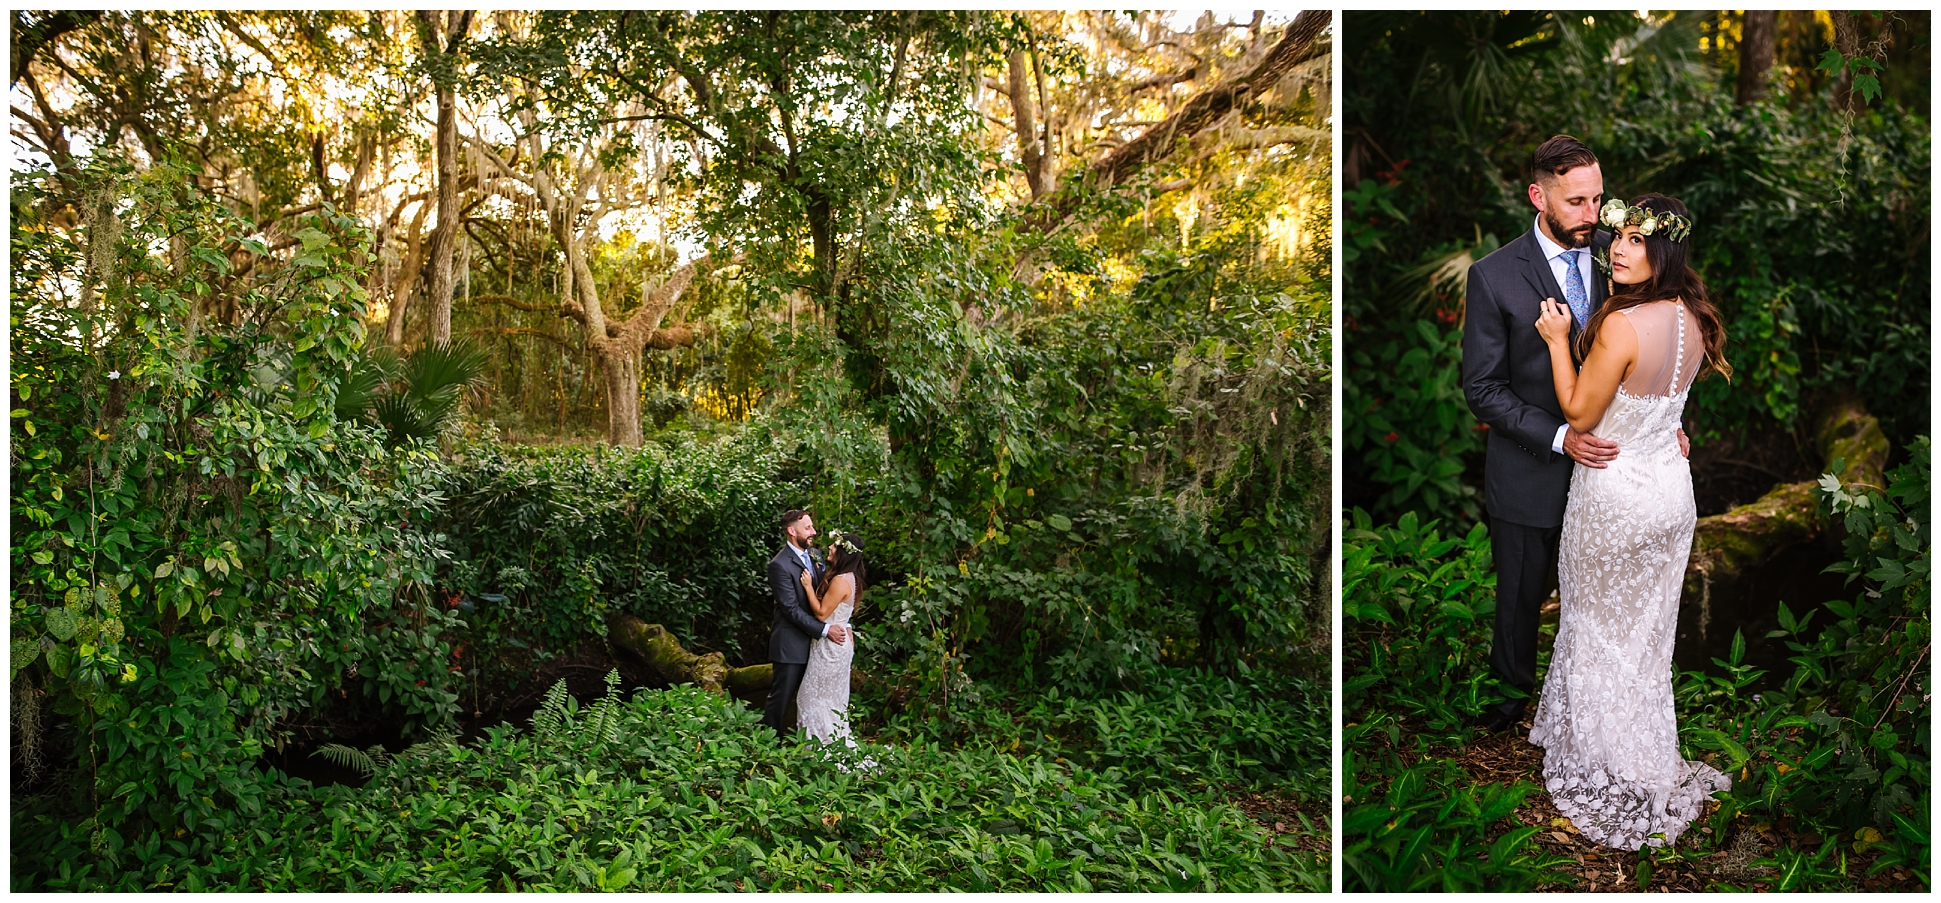 Ashlee-hamon-photography-year-in-review-2016-travel-wanderlust-vsco-adventure-wedding_0102.jpg